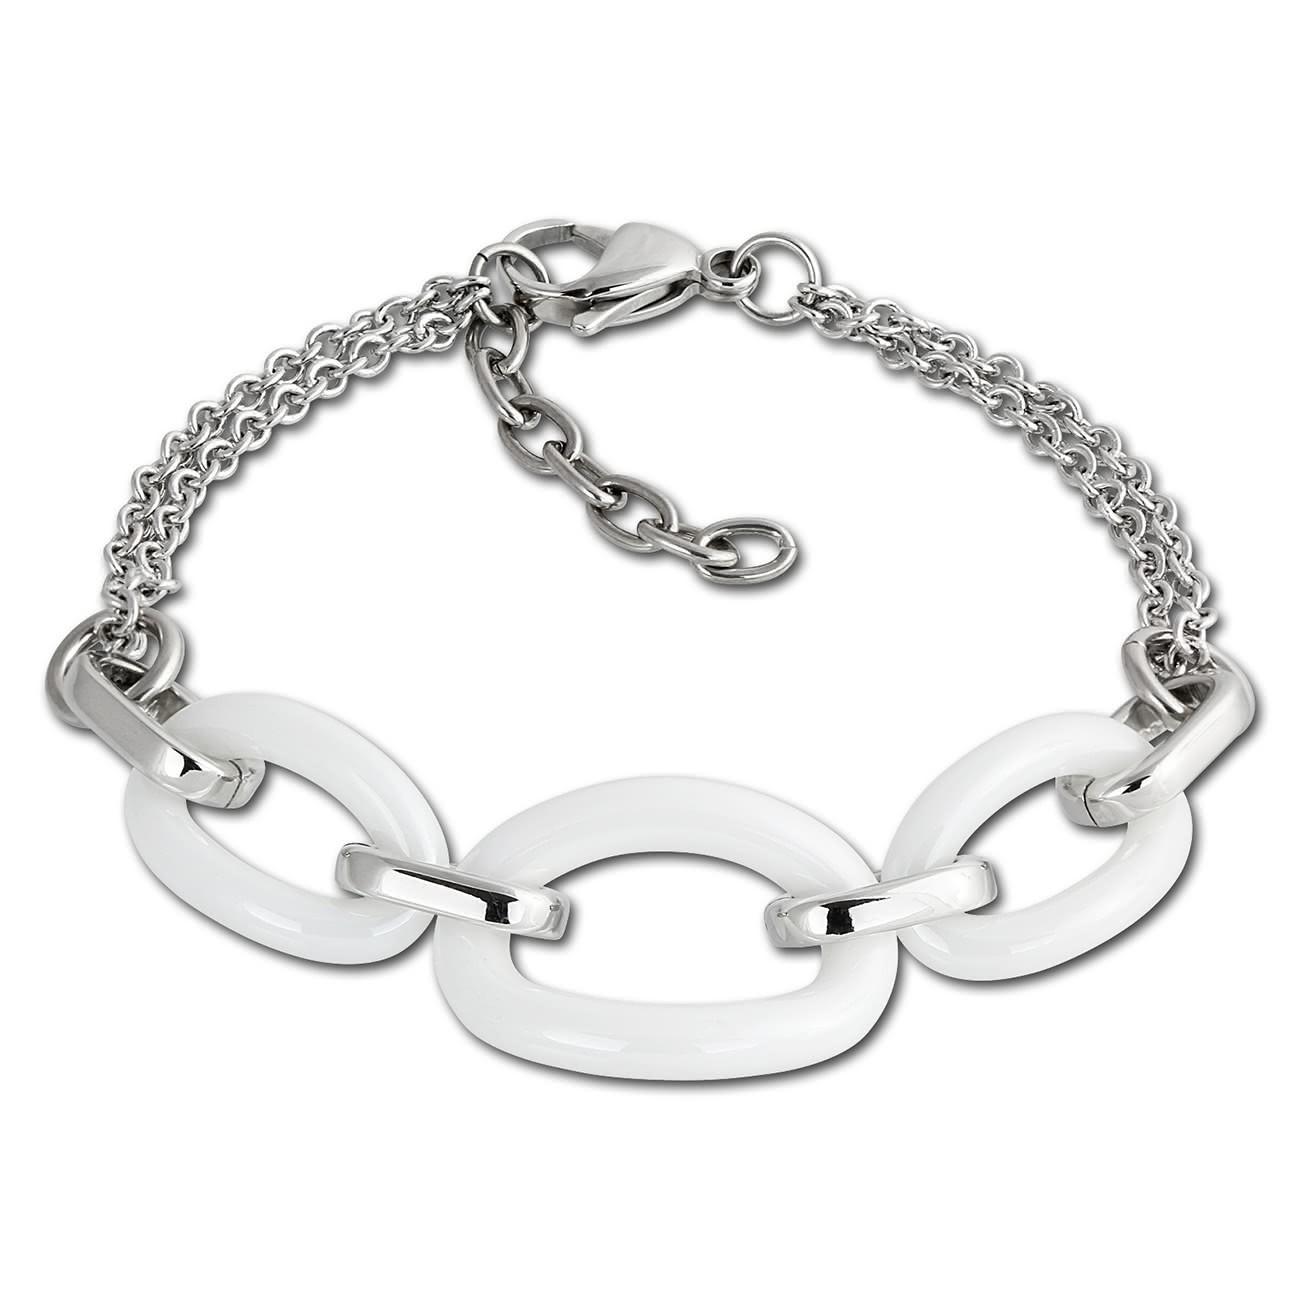 Amello Armband Keramik Ovale weiß Damen Edelstahlschmuck ESAX16W